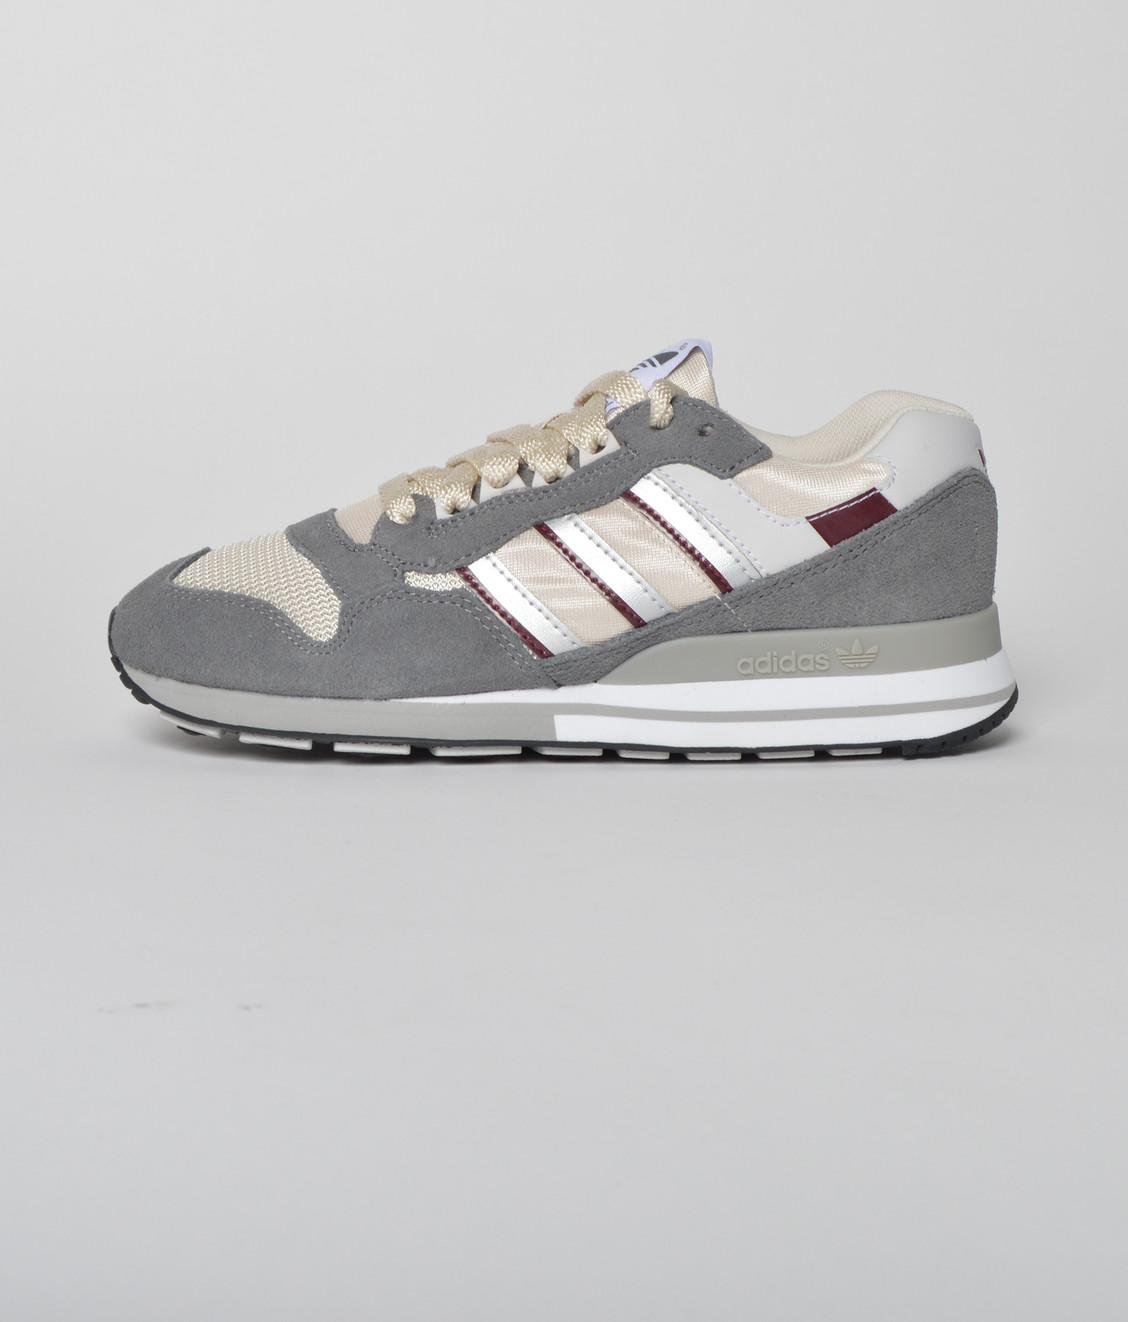 Adidas Adidas SPZL ZX530 Grey Burgundy